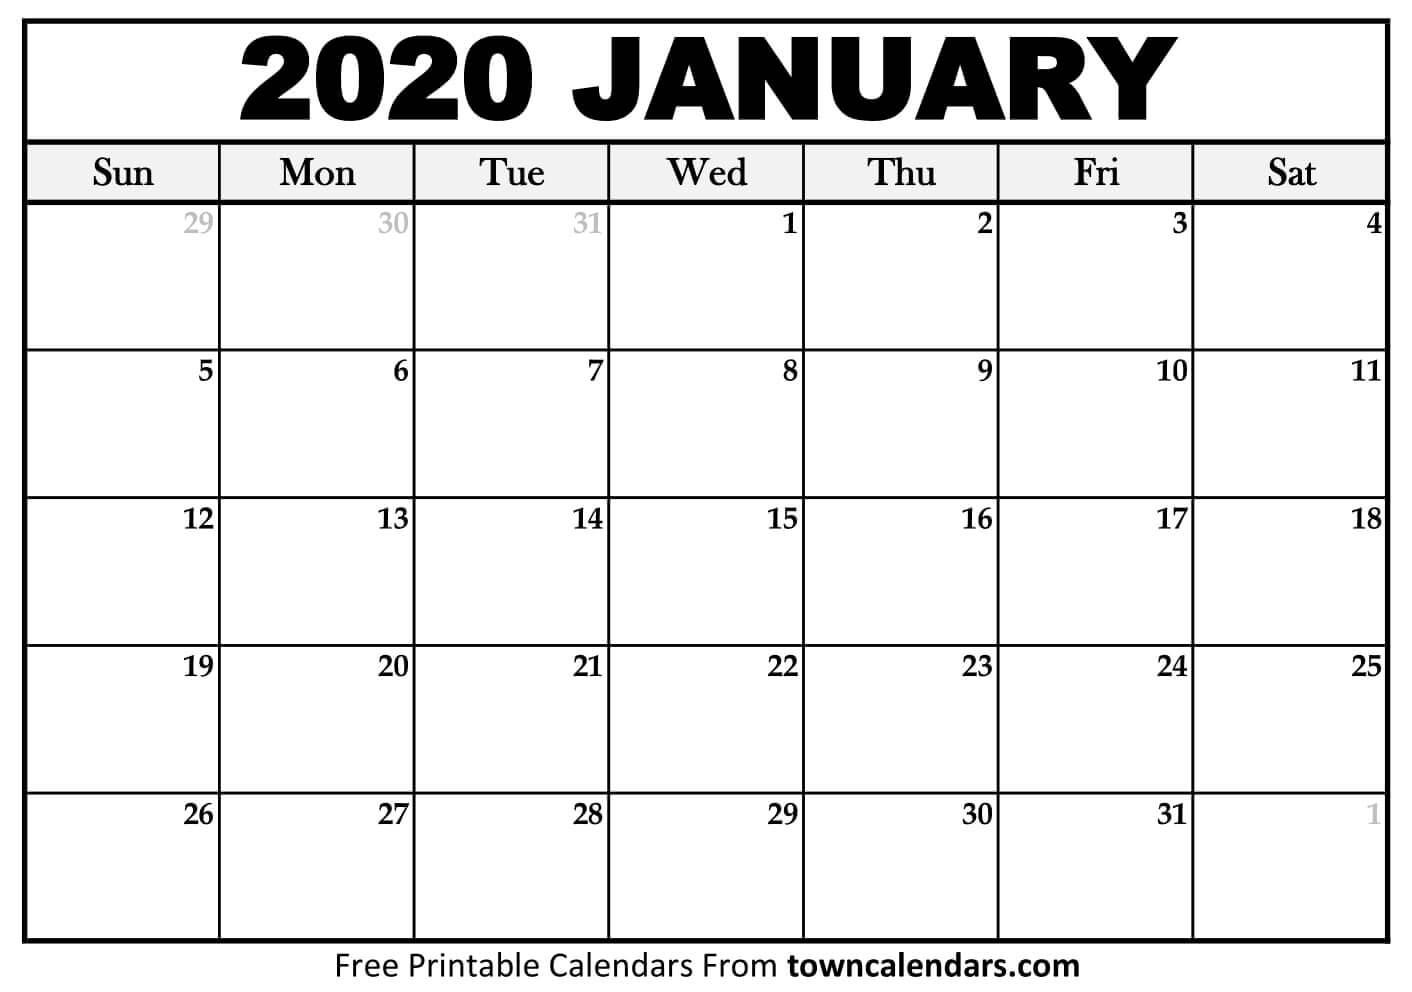 2020 Calendar Printable - Towncalendars  2020 Calendar Free Printable